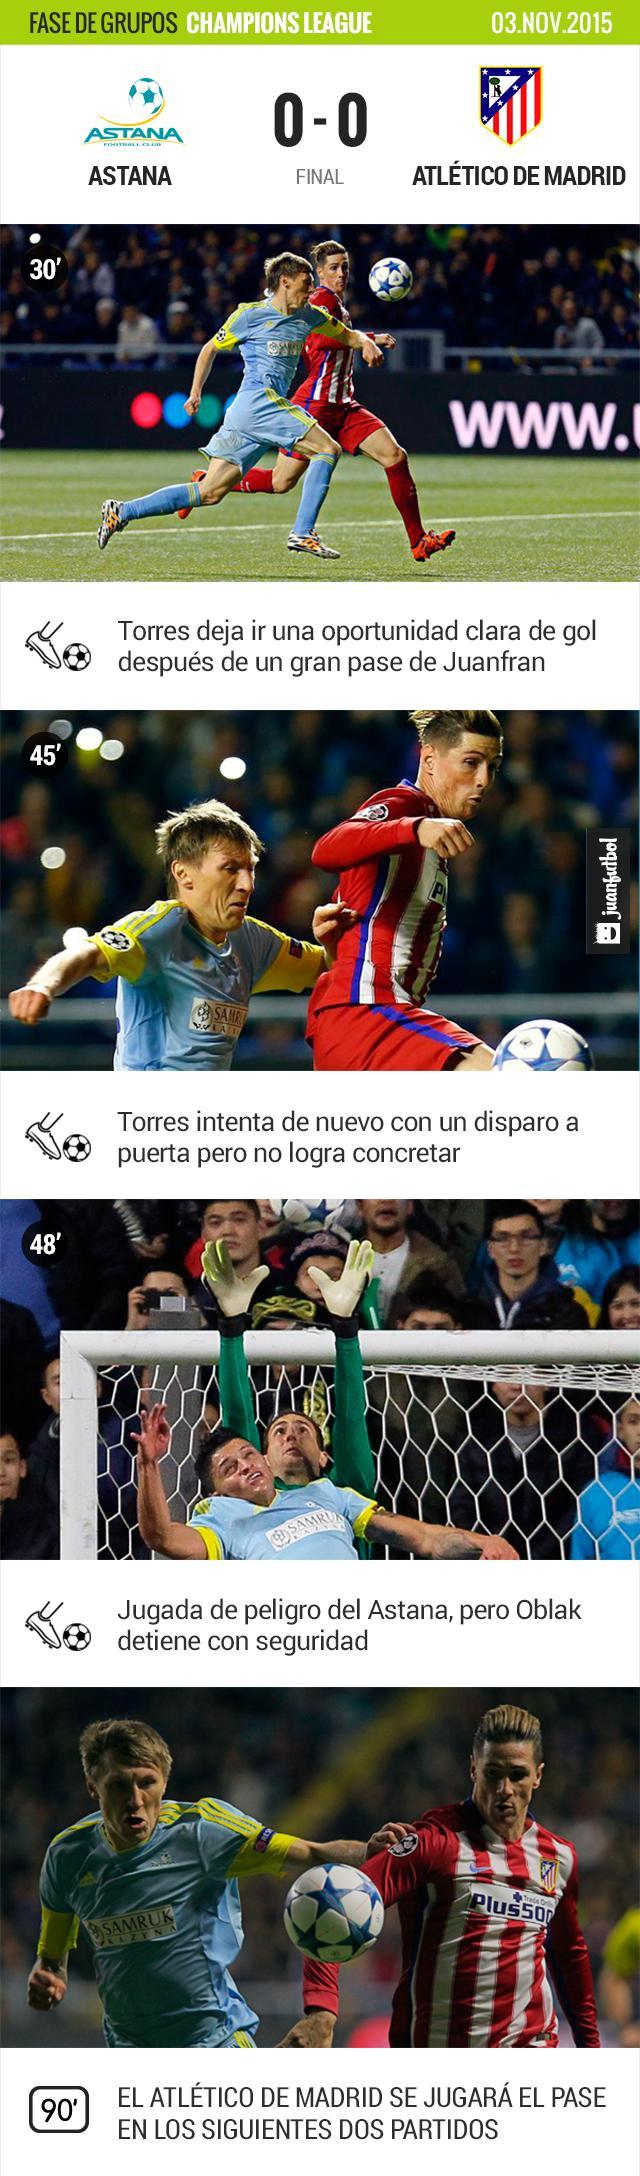 Atlético vs Astana